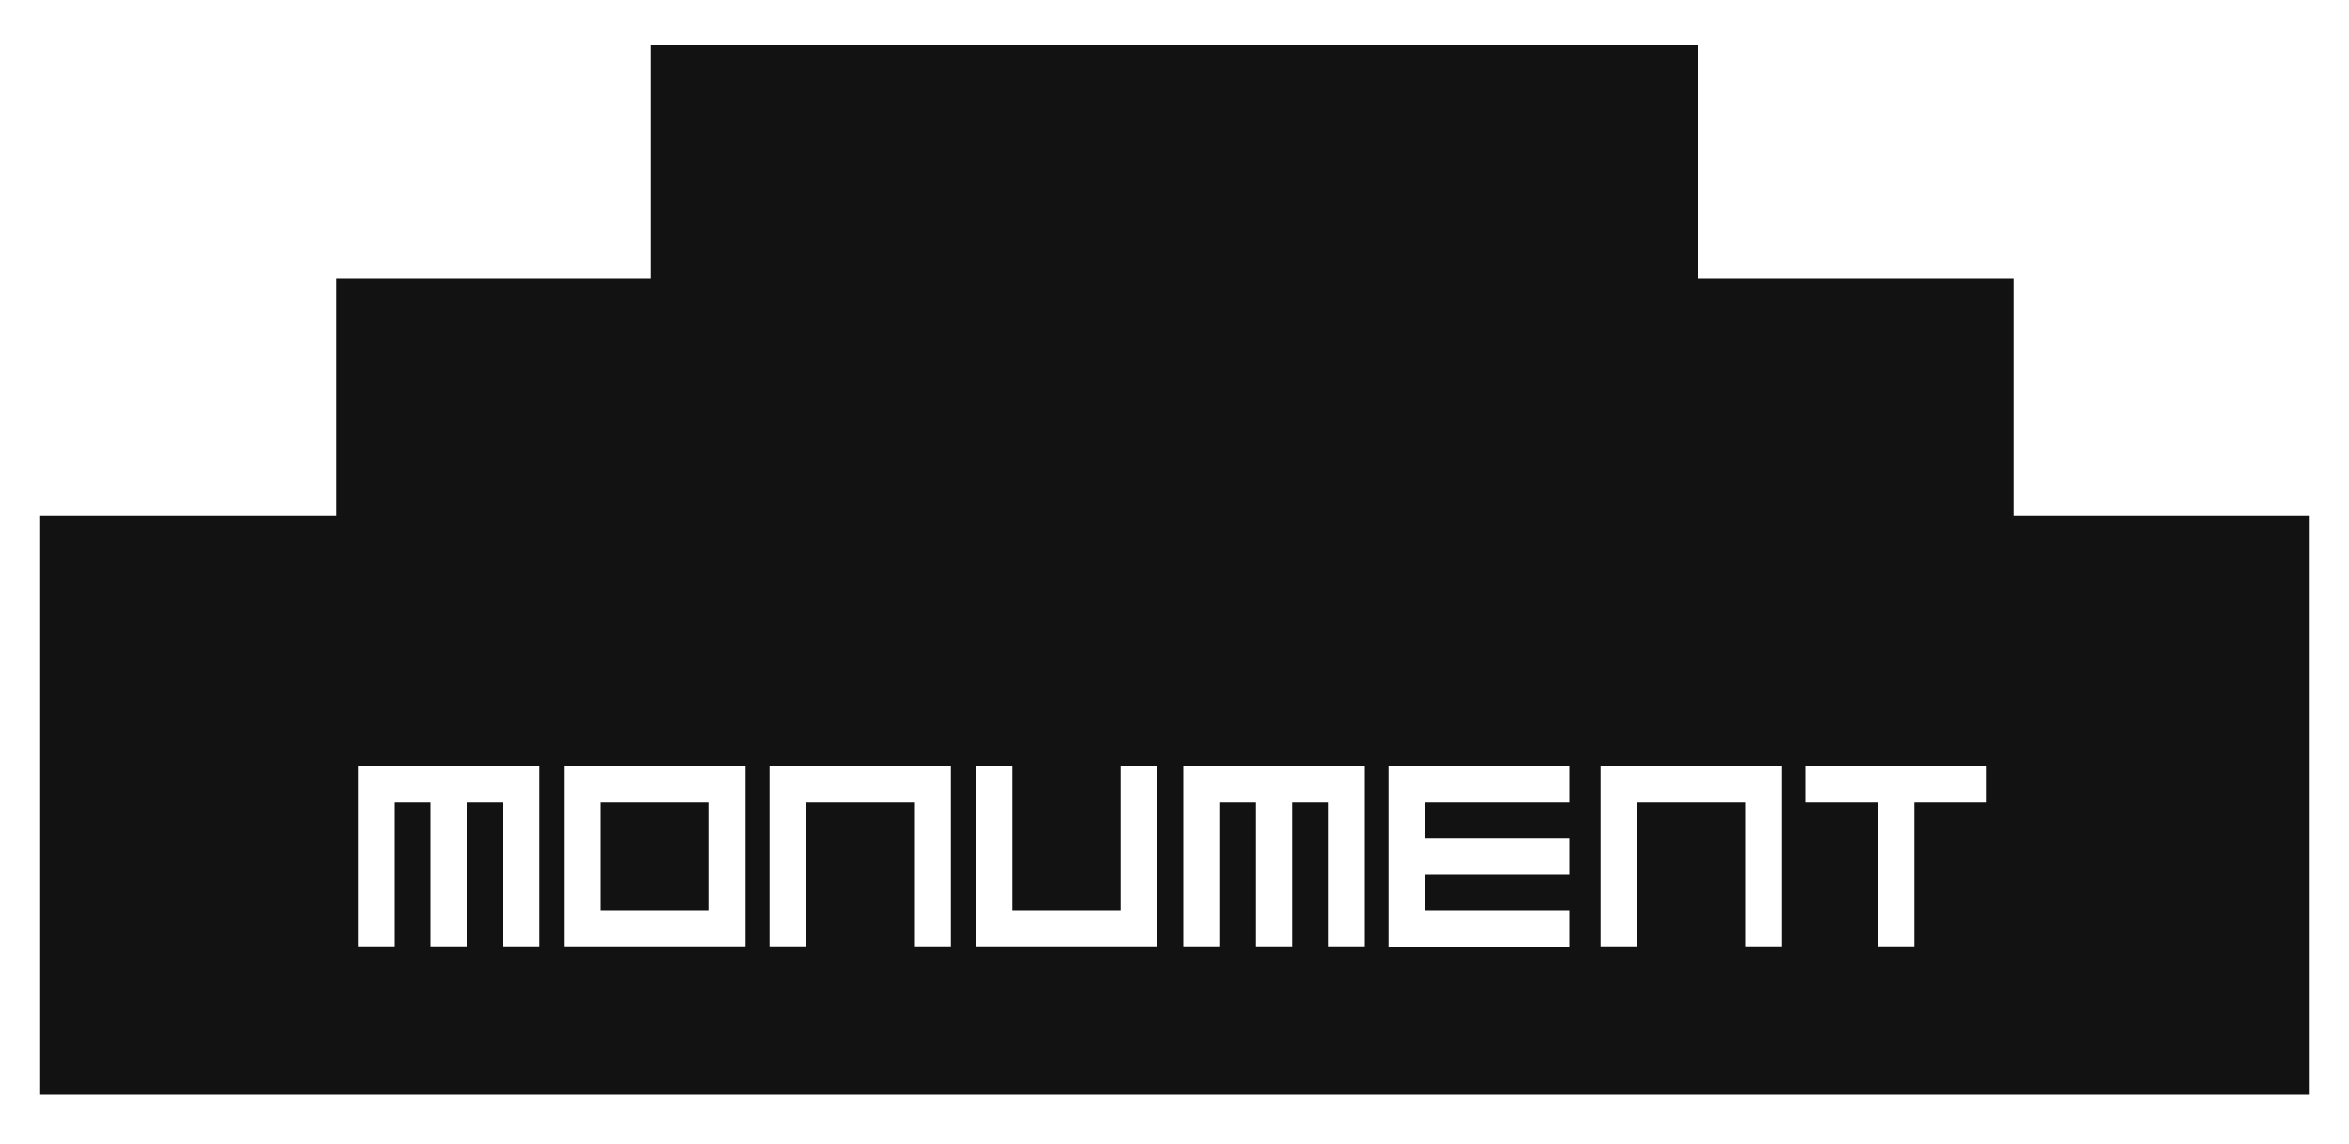 monument-theMonument-HR-1-97percent-black.png